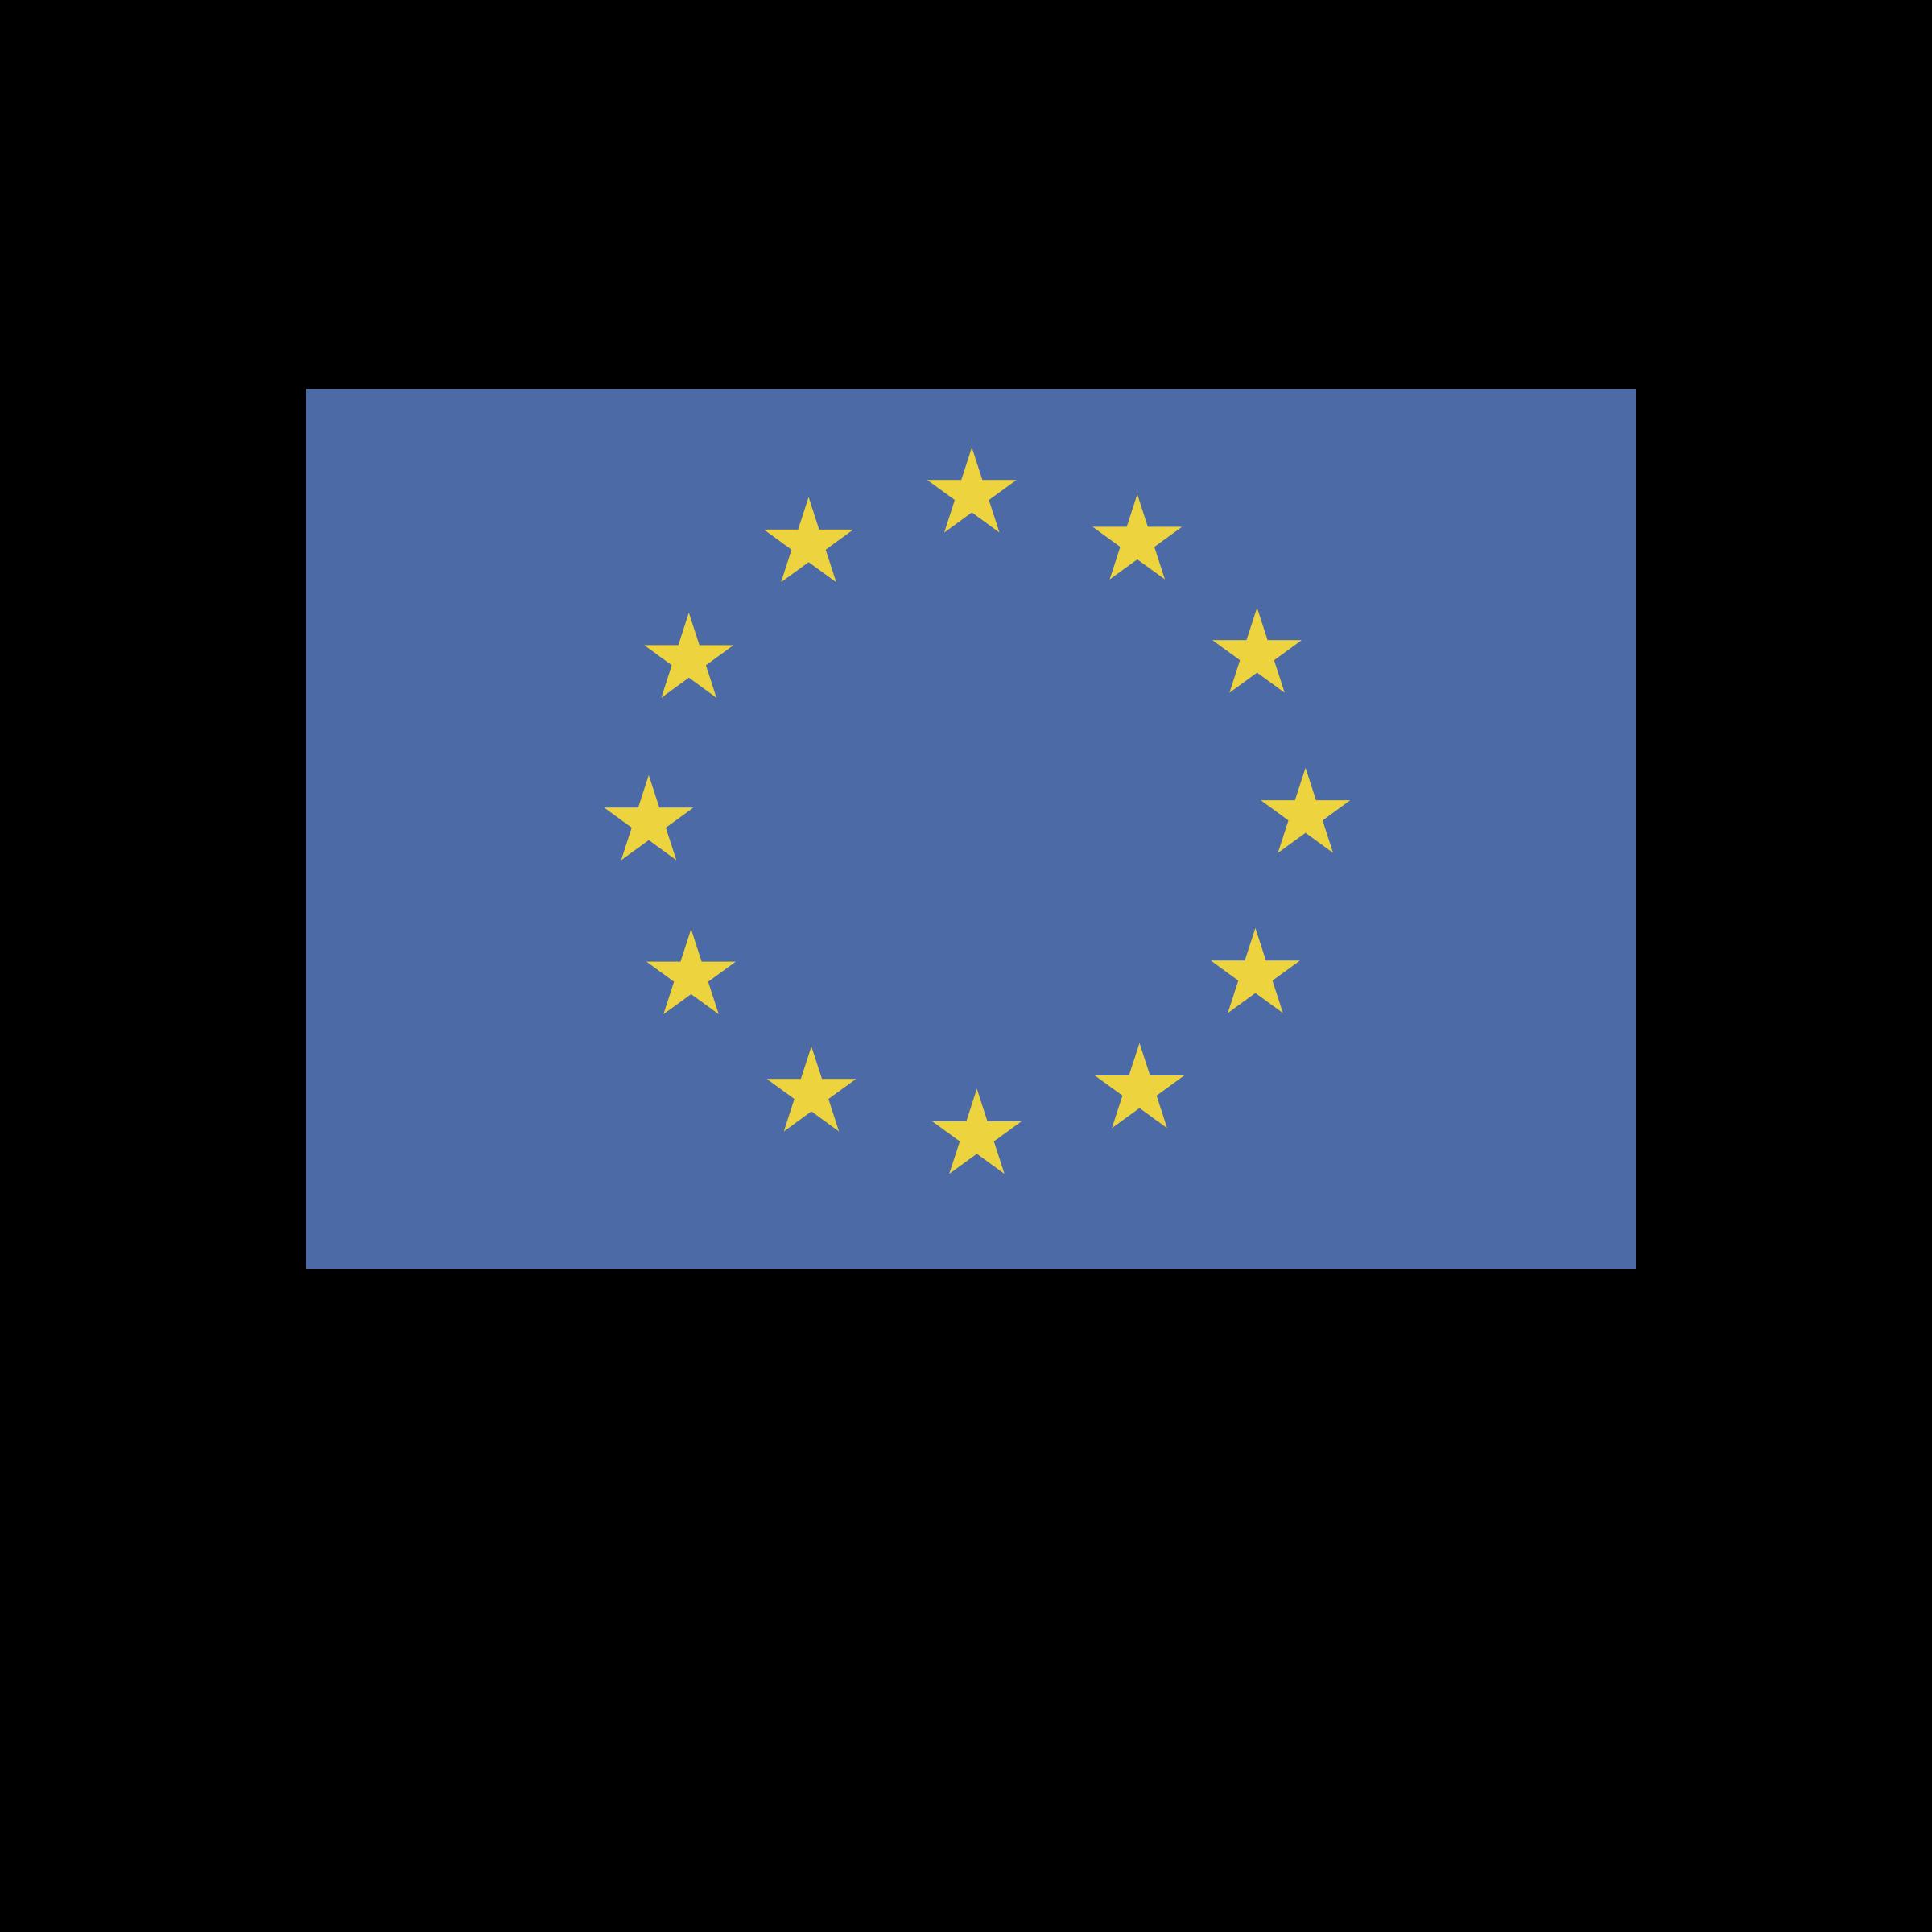 European Commission Logo PNG Transparent & SVG Vector.